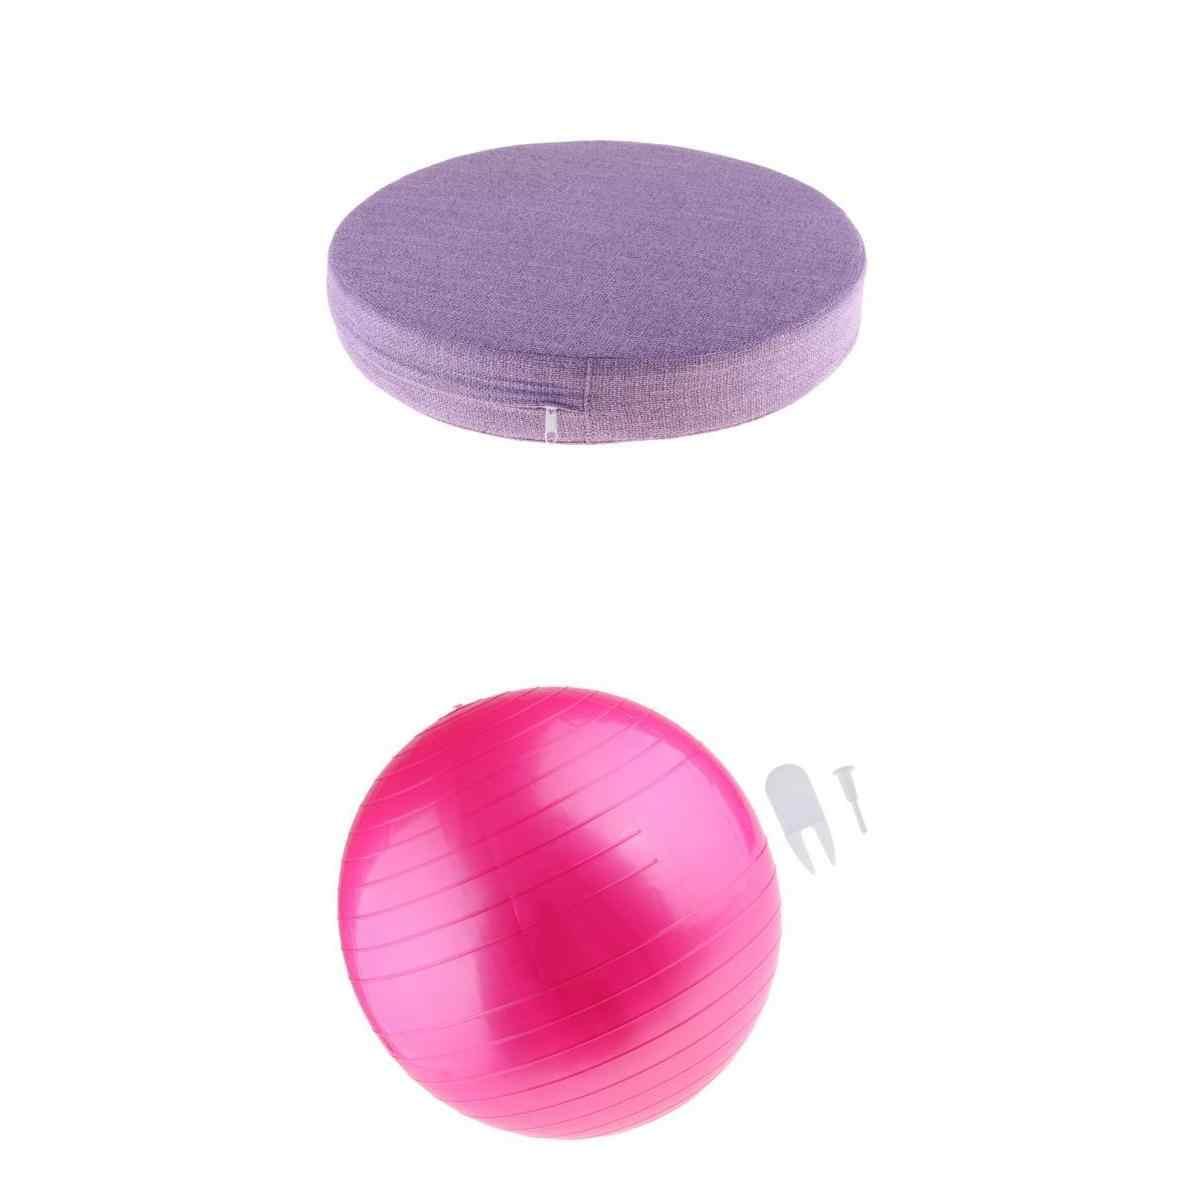 Yoga Meditation Cushion Round Yoga Pads & Yoga Ball Exercise PVC Yoga Ball, Durable to Use